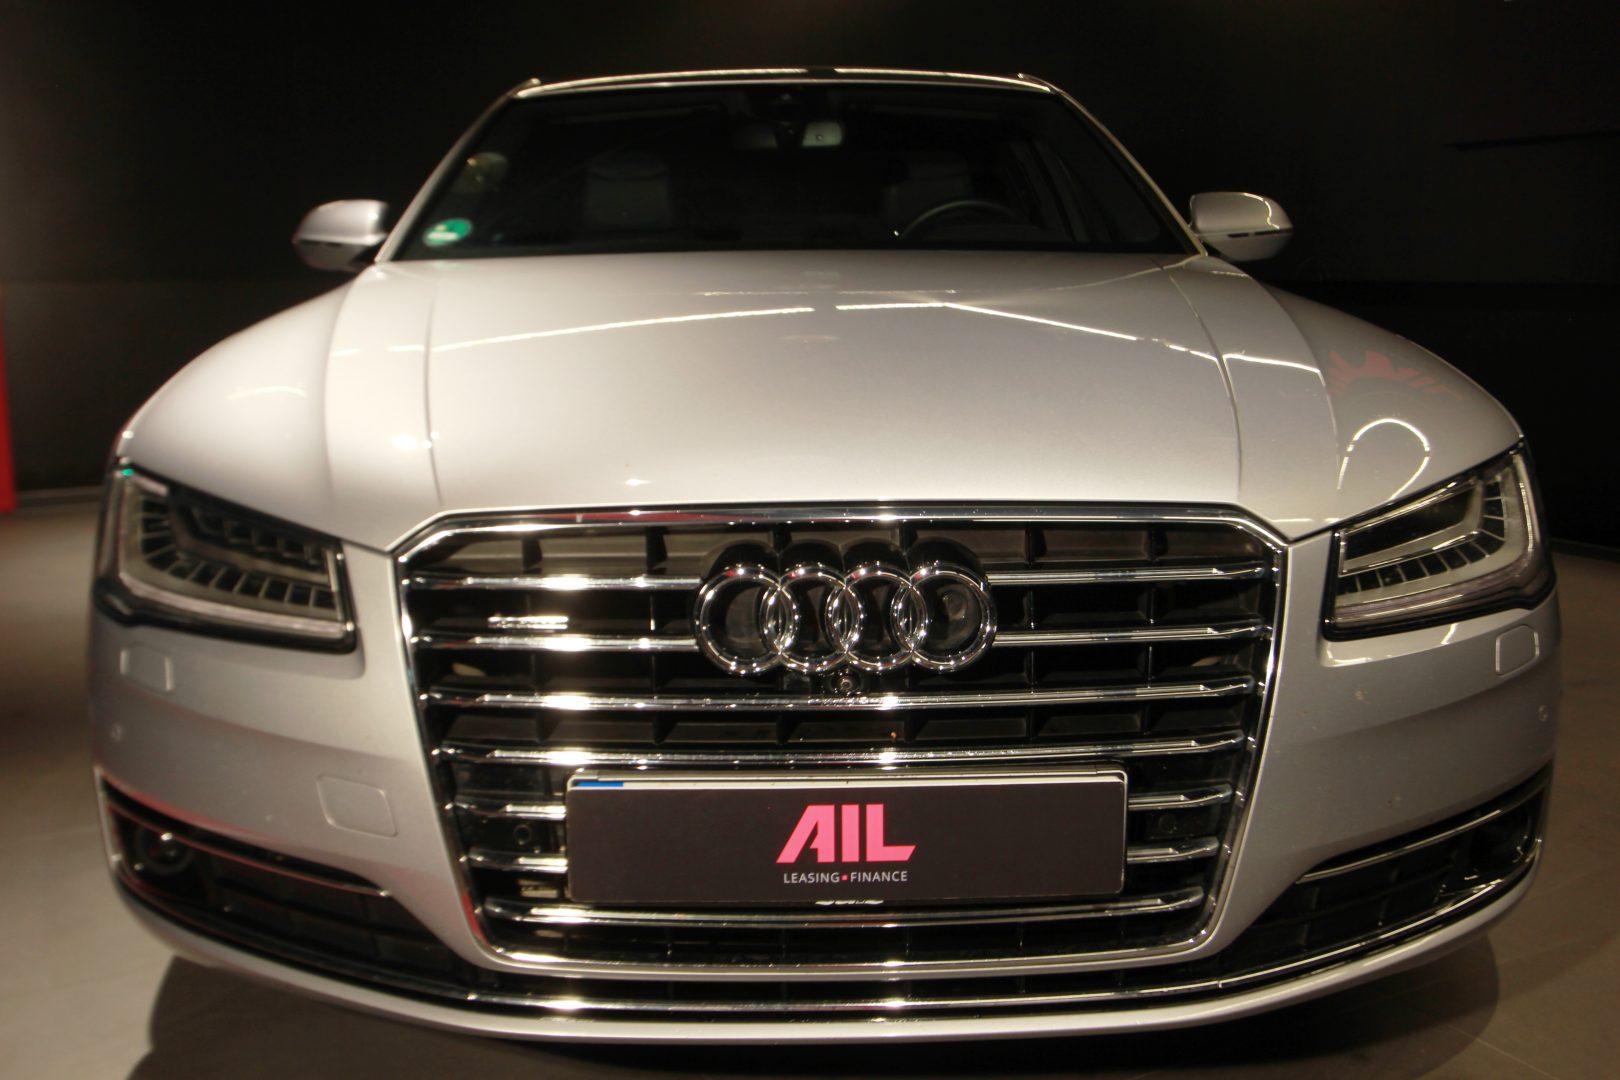 AIL Audi A8 3.0 TDI DAB Bose  9